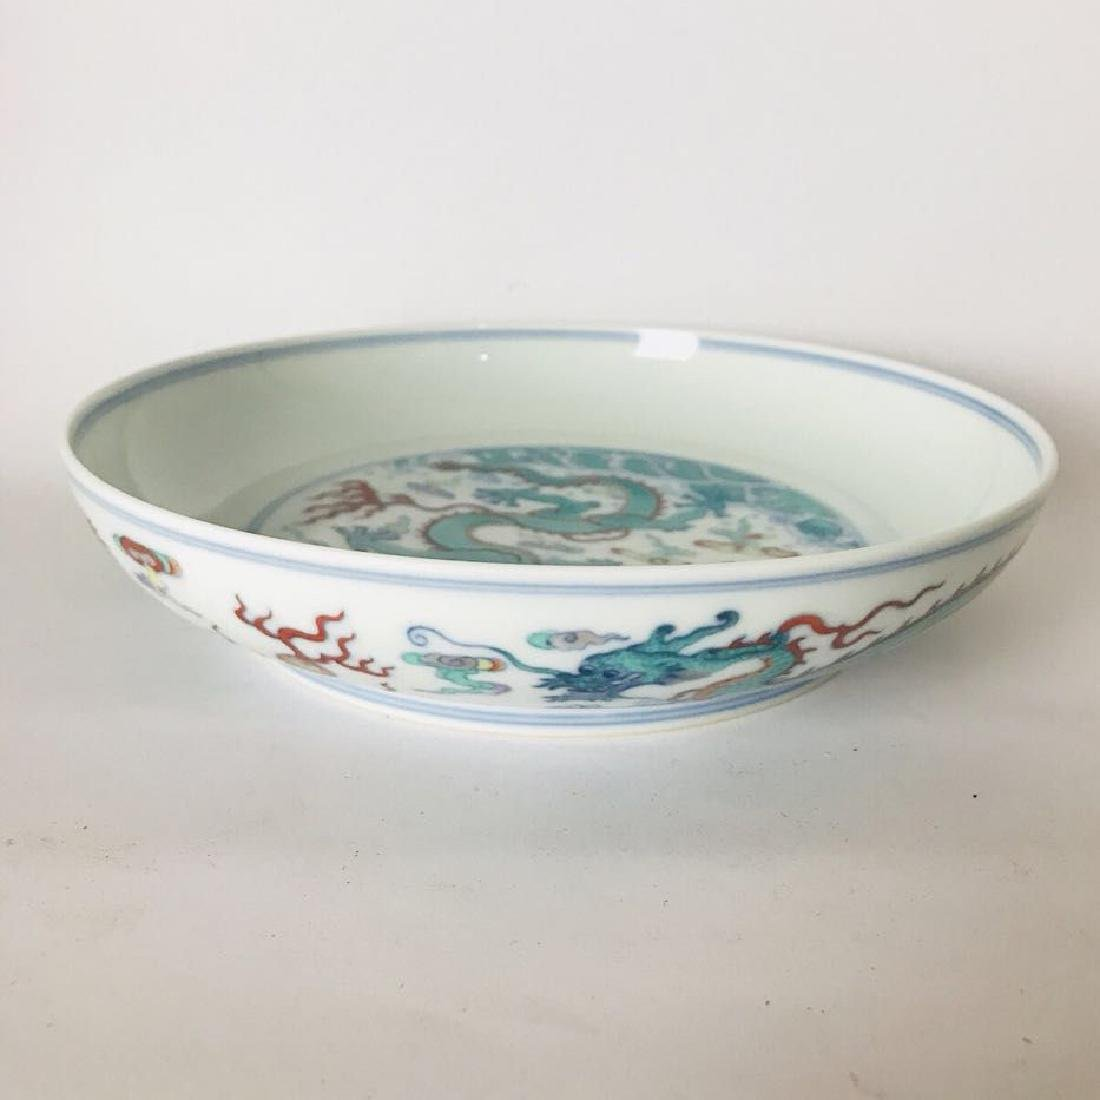 DouCai Porcelain Dragon Plate Mark Da Qing